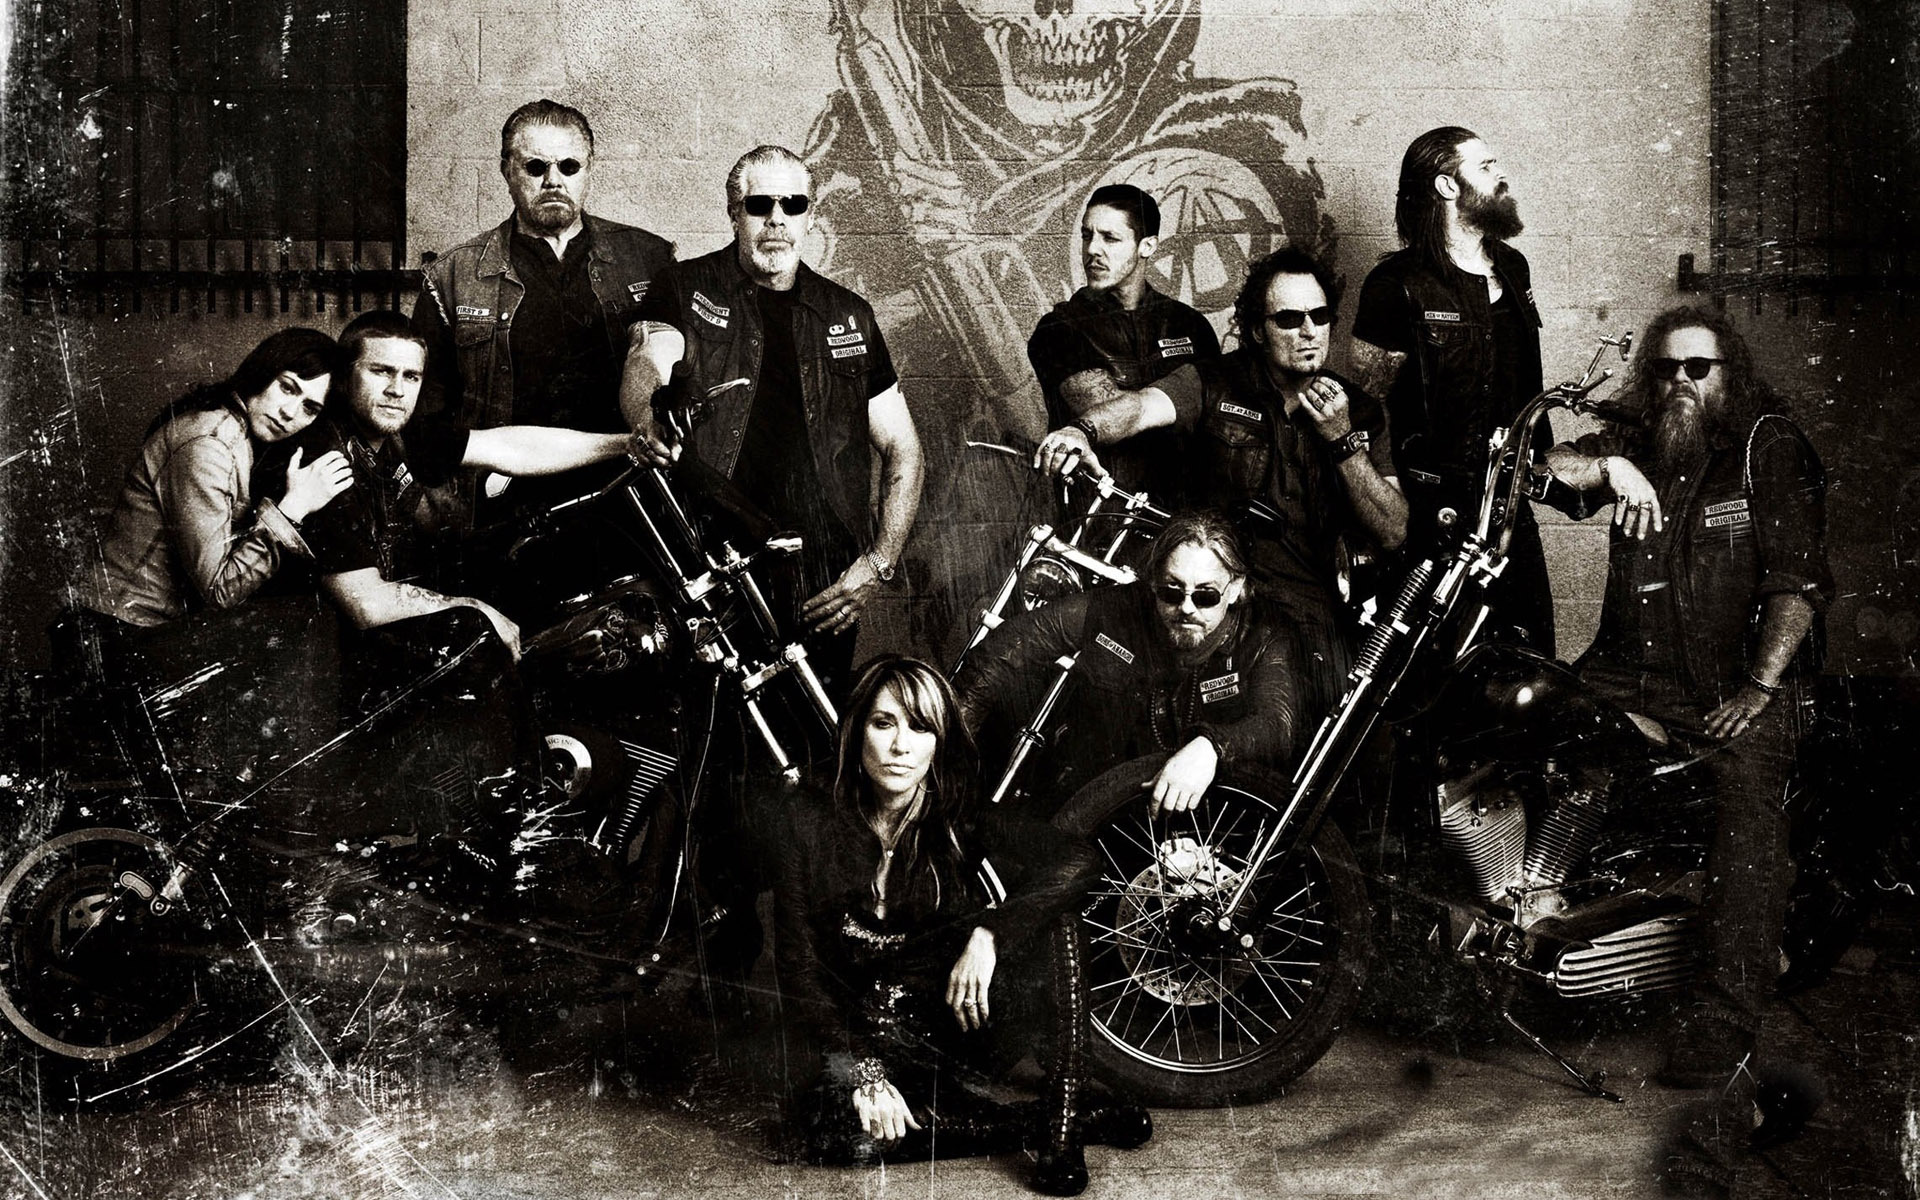 sons-of-anarchy-18716.jpg